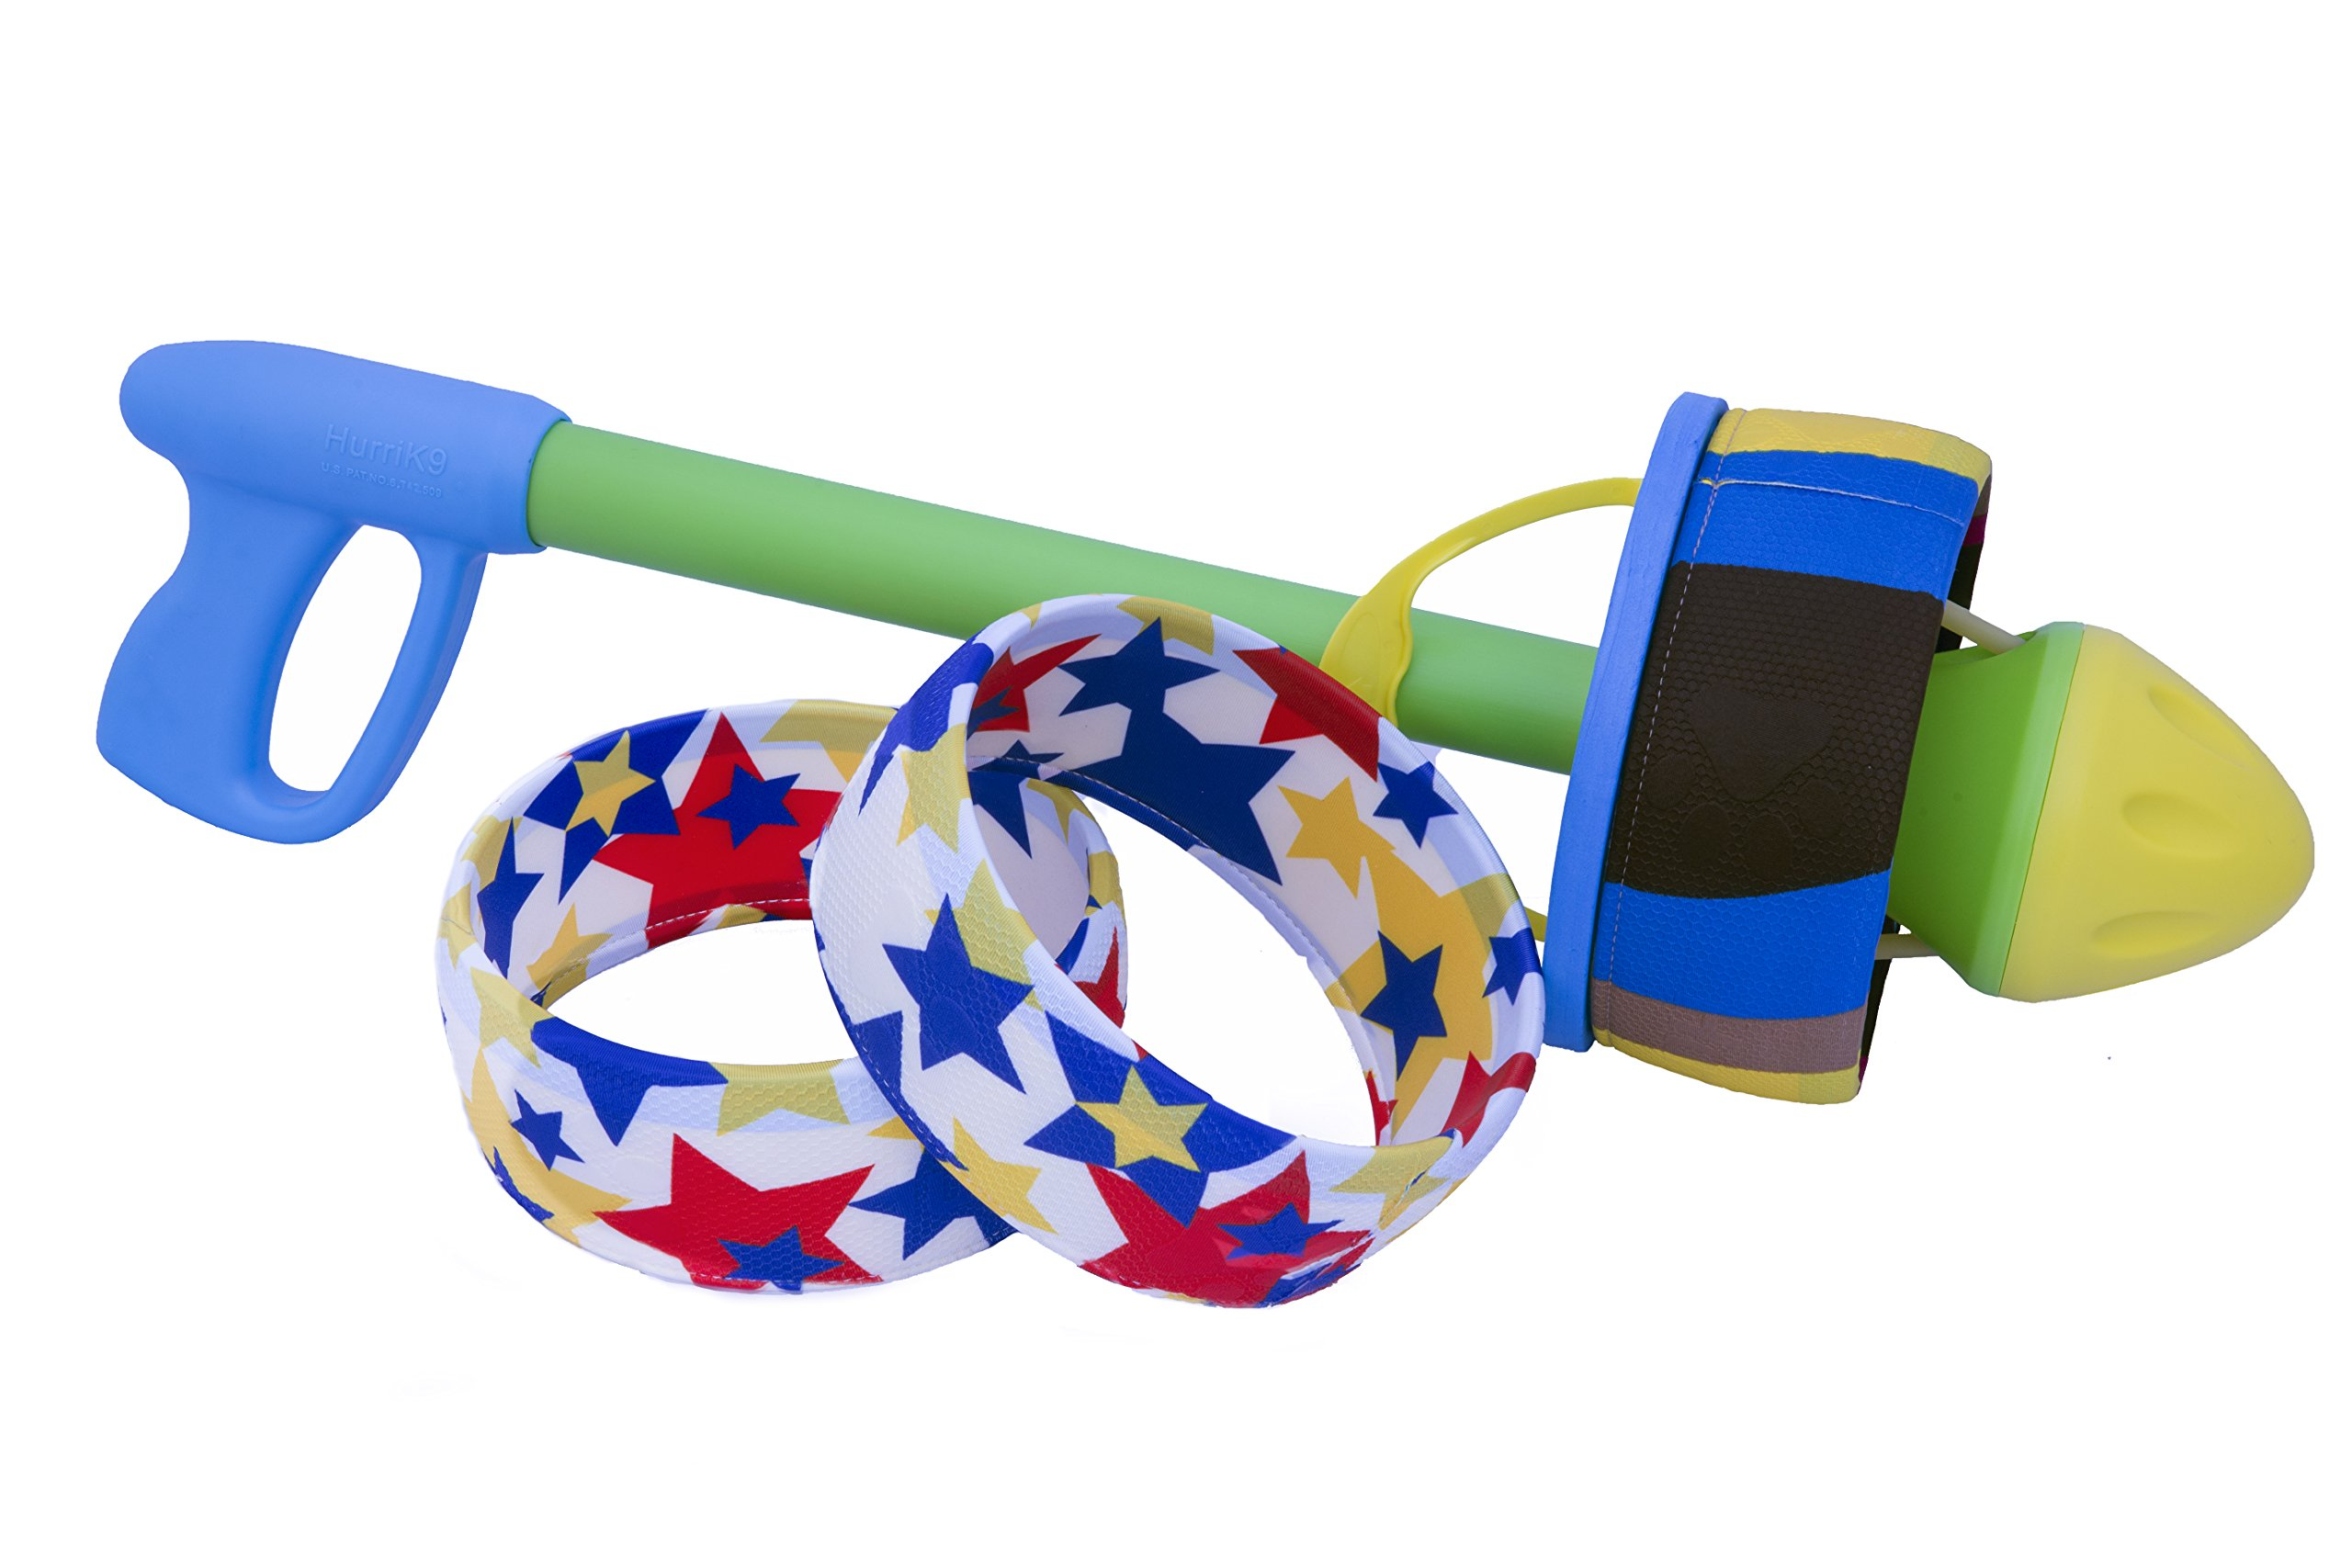 HurriK9 - Flying Ring Launcher for Dogs (Starter Pack - Launcher + 3 Extra Tough Spandex Rings) by HurriK9